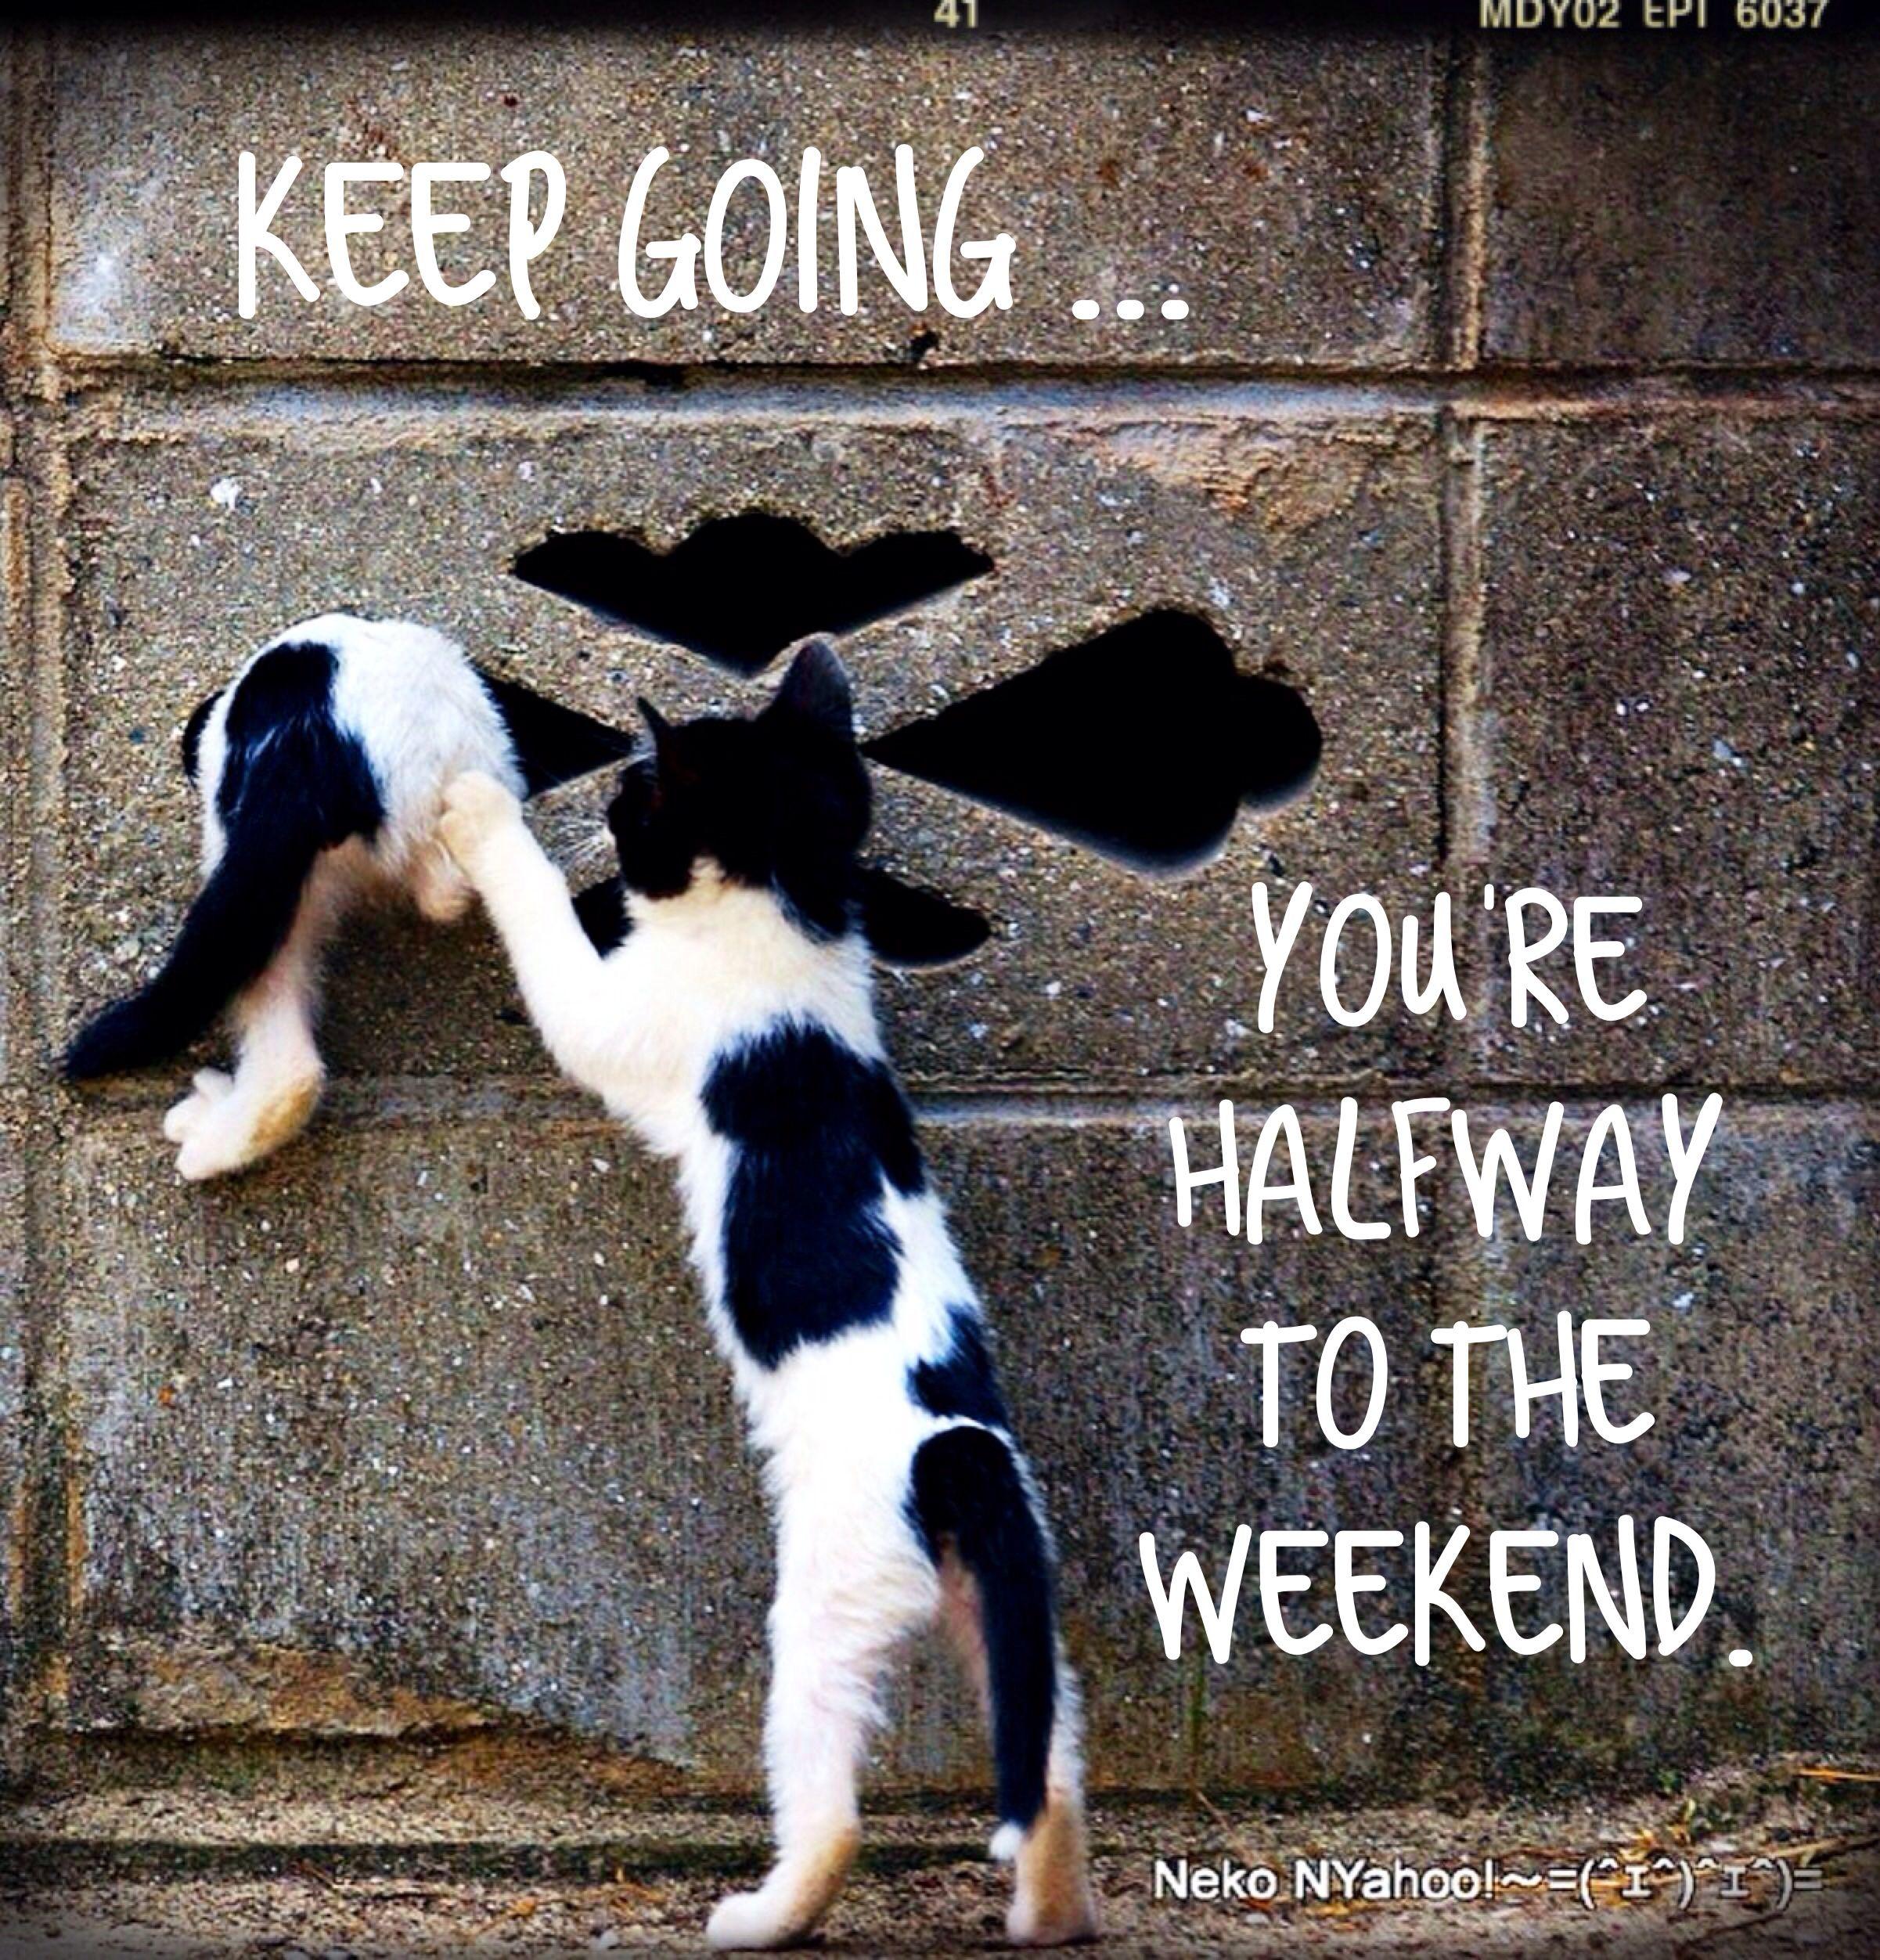 Wednesday humor | Halfway to the weekend | Halfway through ...